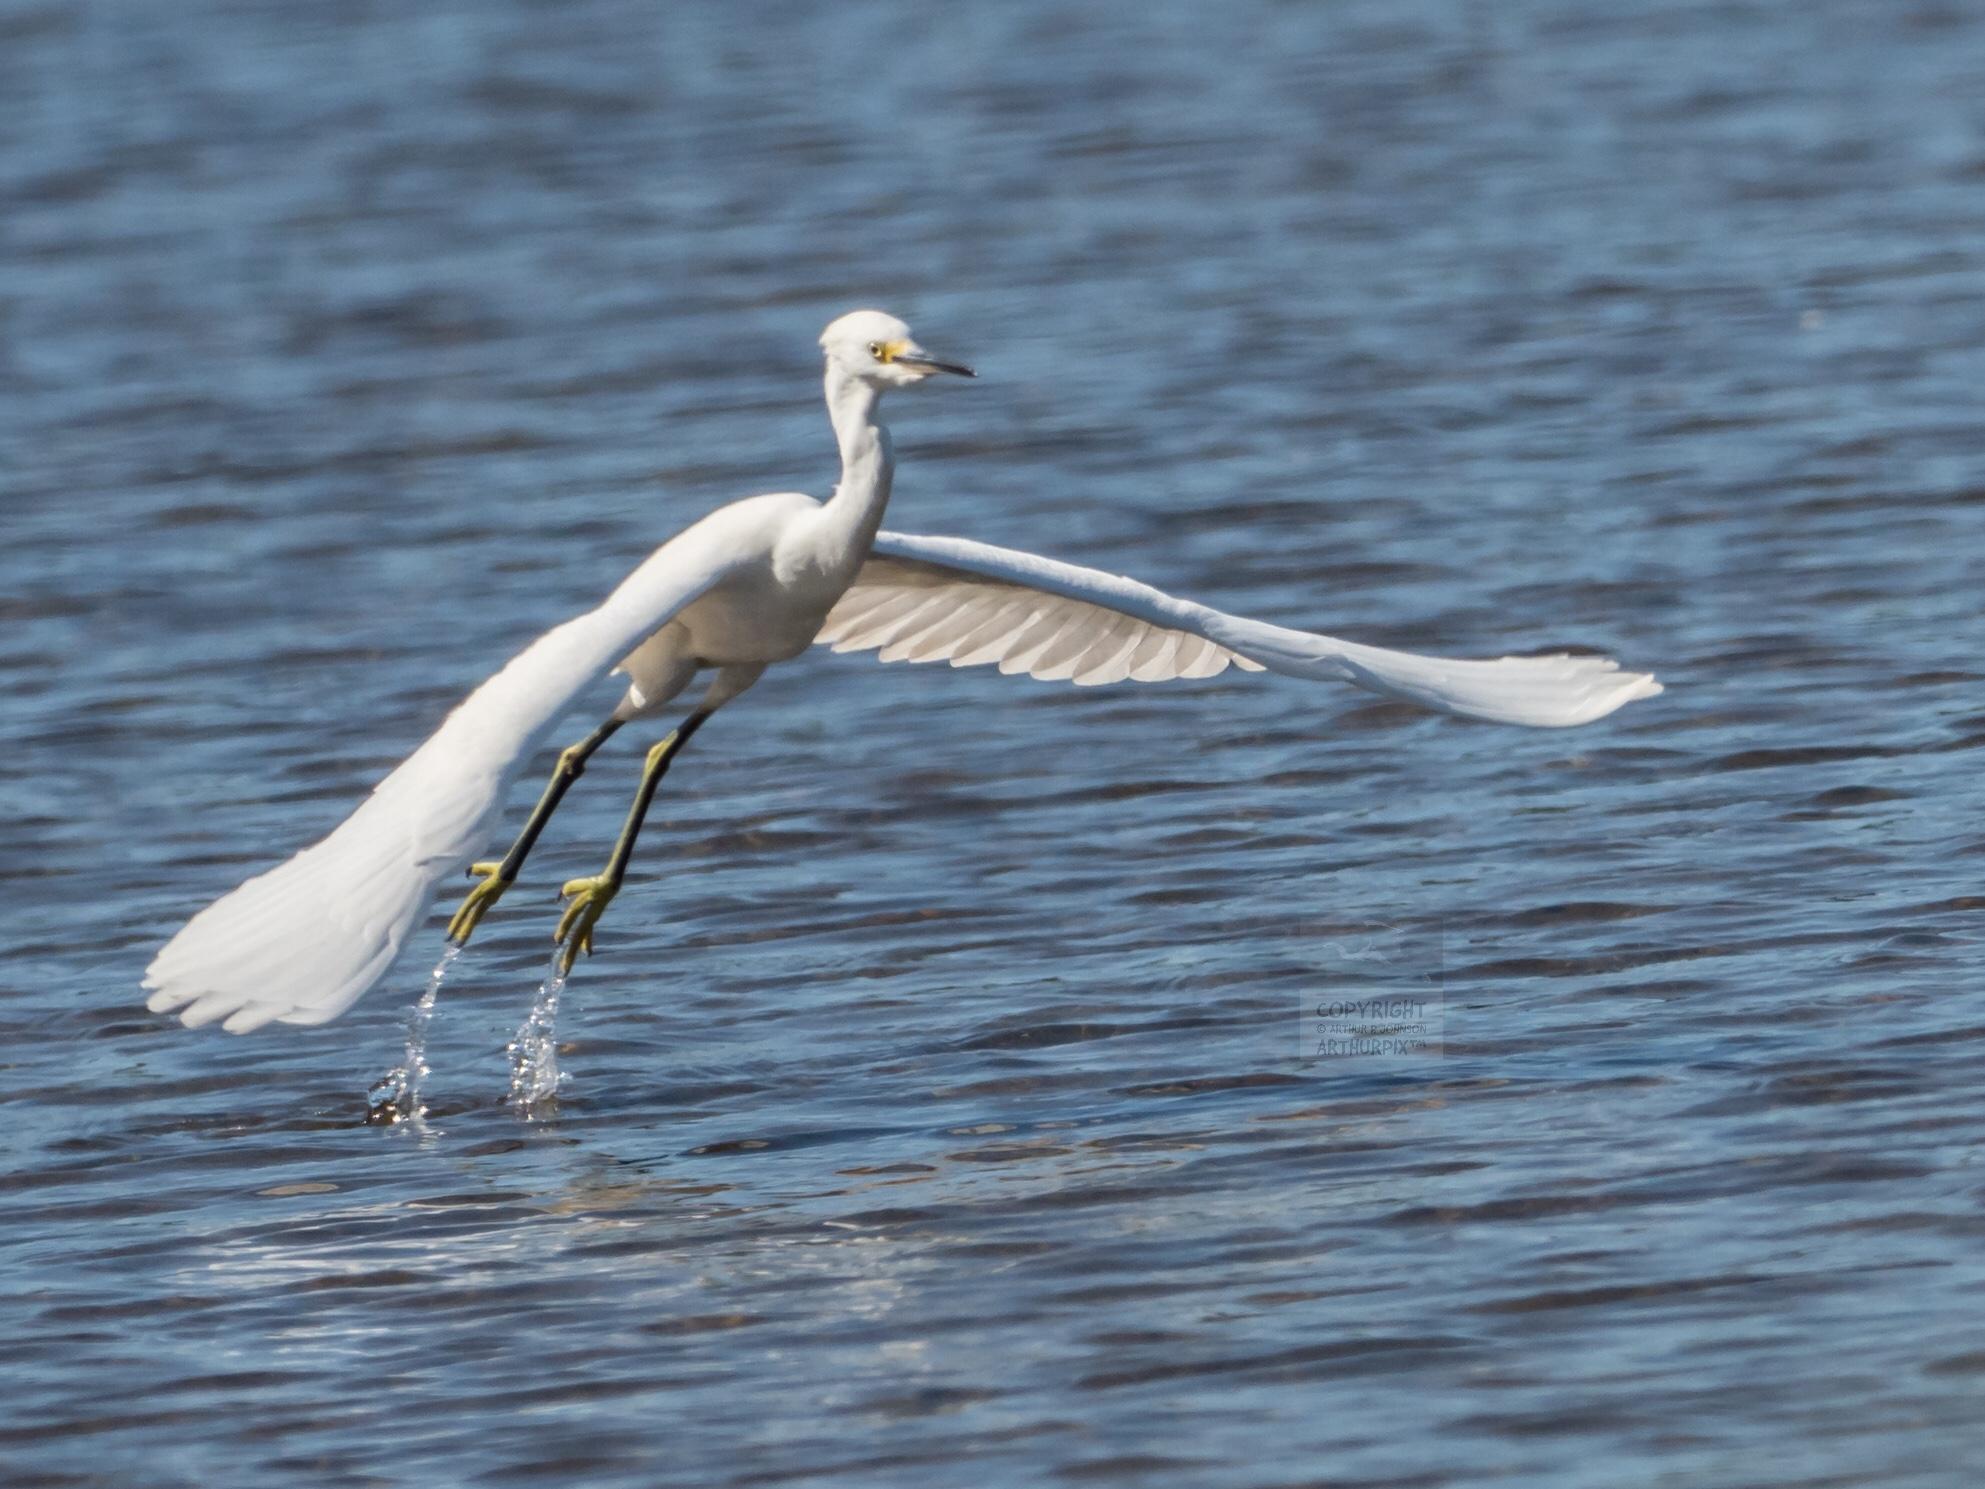 Juvenile Great Egret Taking Flight